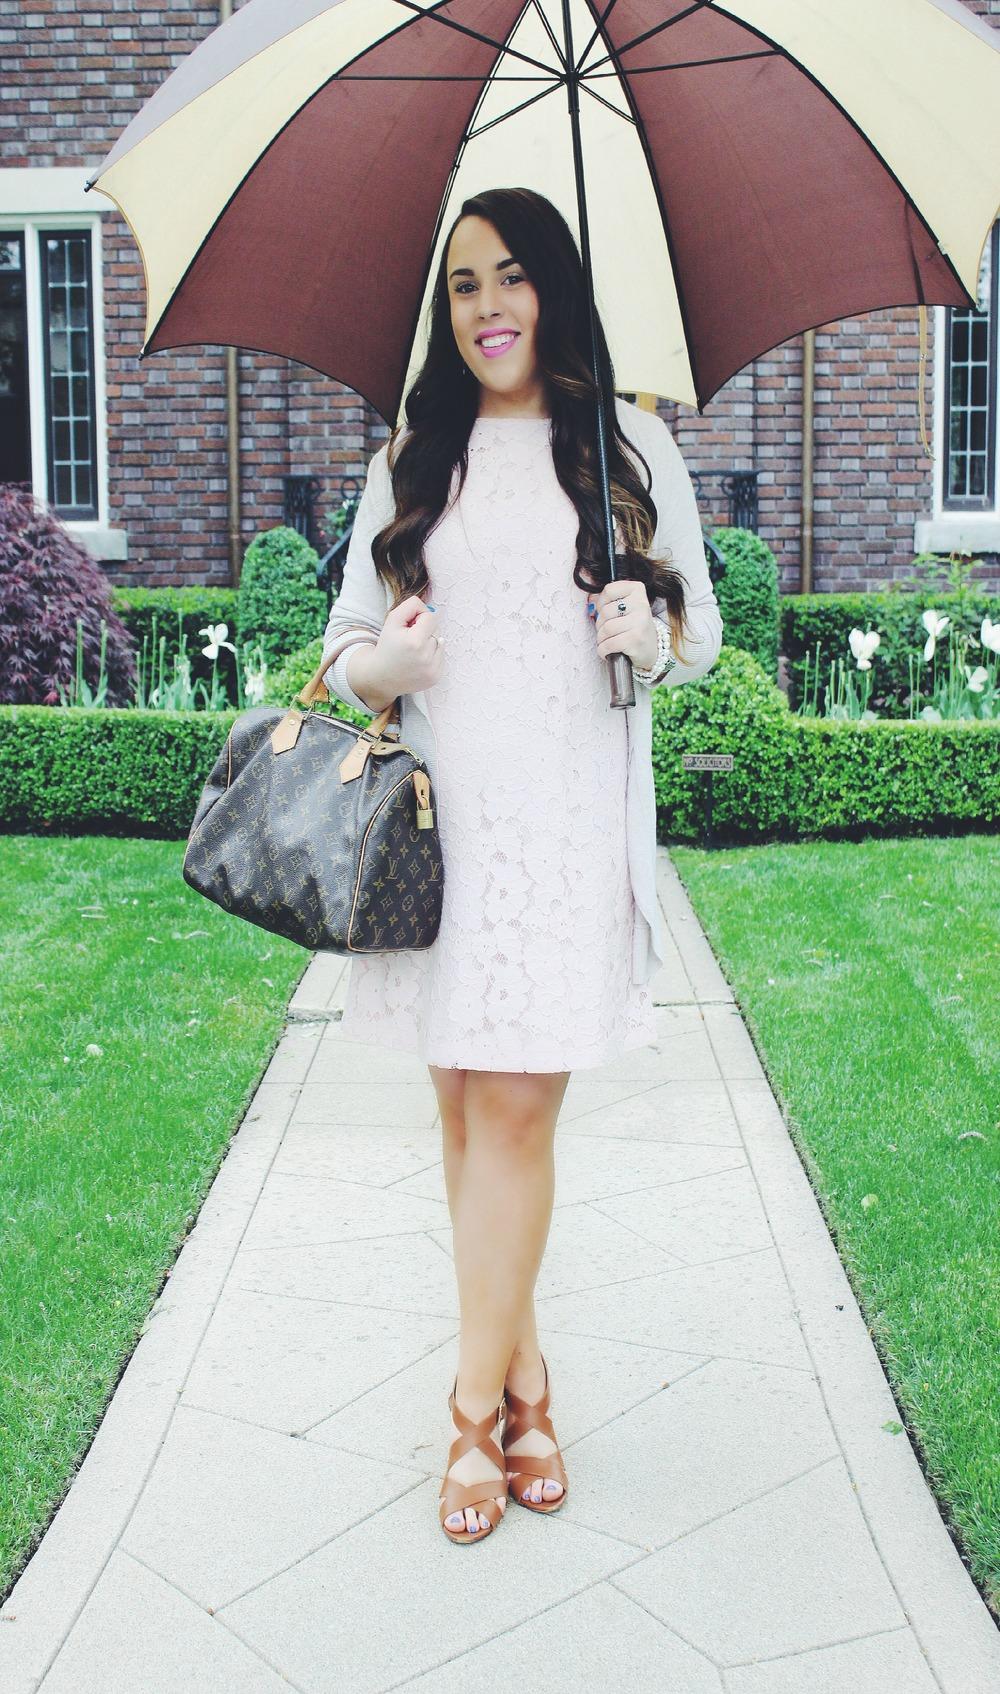 Dress: BB  Dakota   Cardigan:  Target .  Shoes: Sole Society, Old. Similar  Here &  Here .  Handbag: Louis  Vuitton .  Rings: David Yurman.  Here  &  Here .  Watch: Michael  Kors .  Bracelets:  Silpada